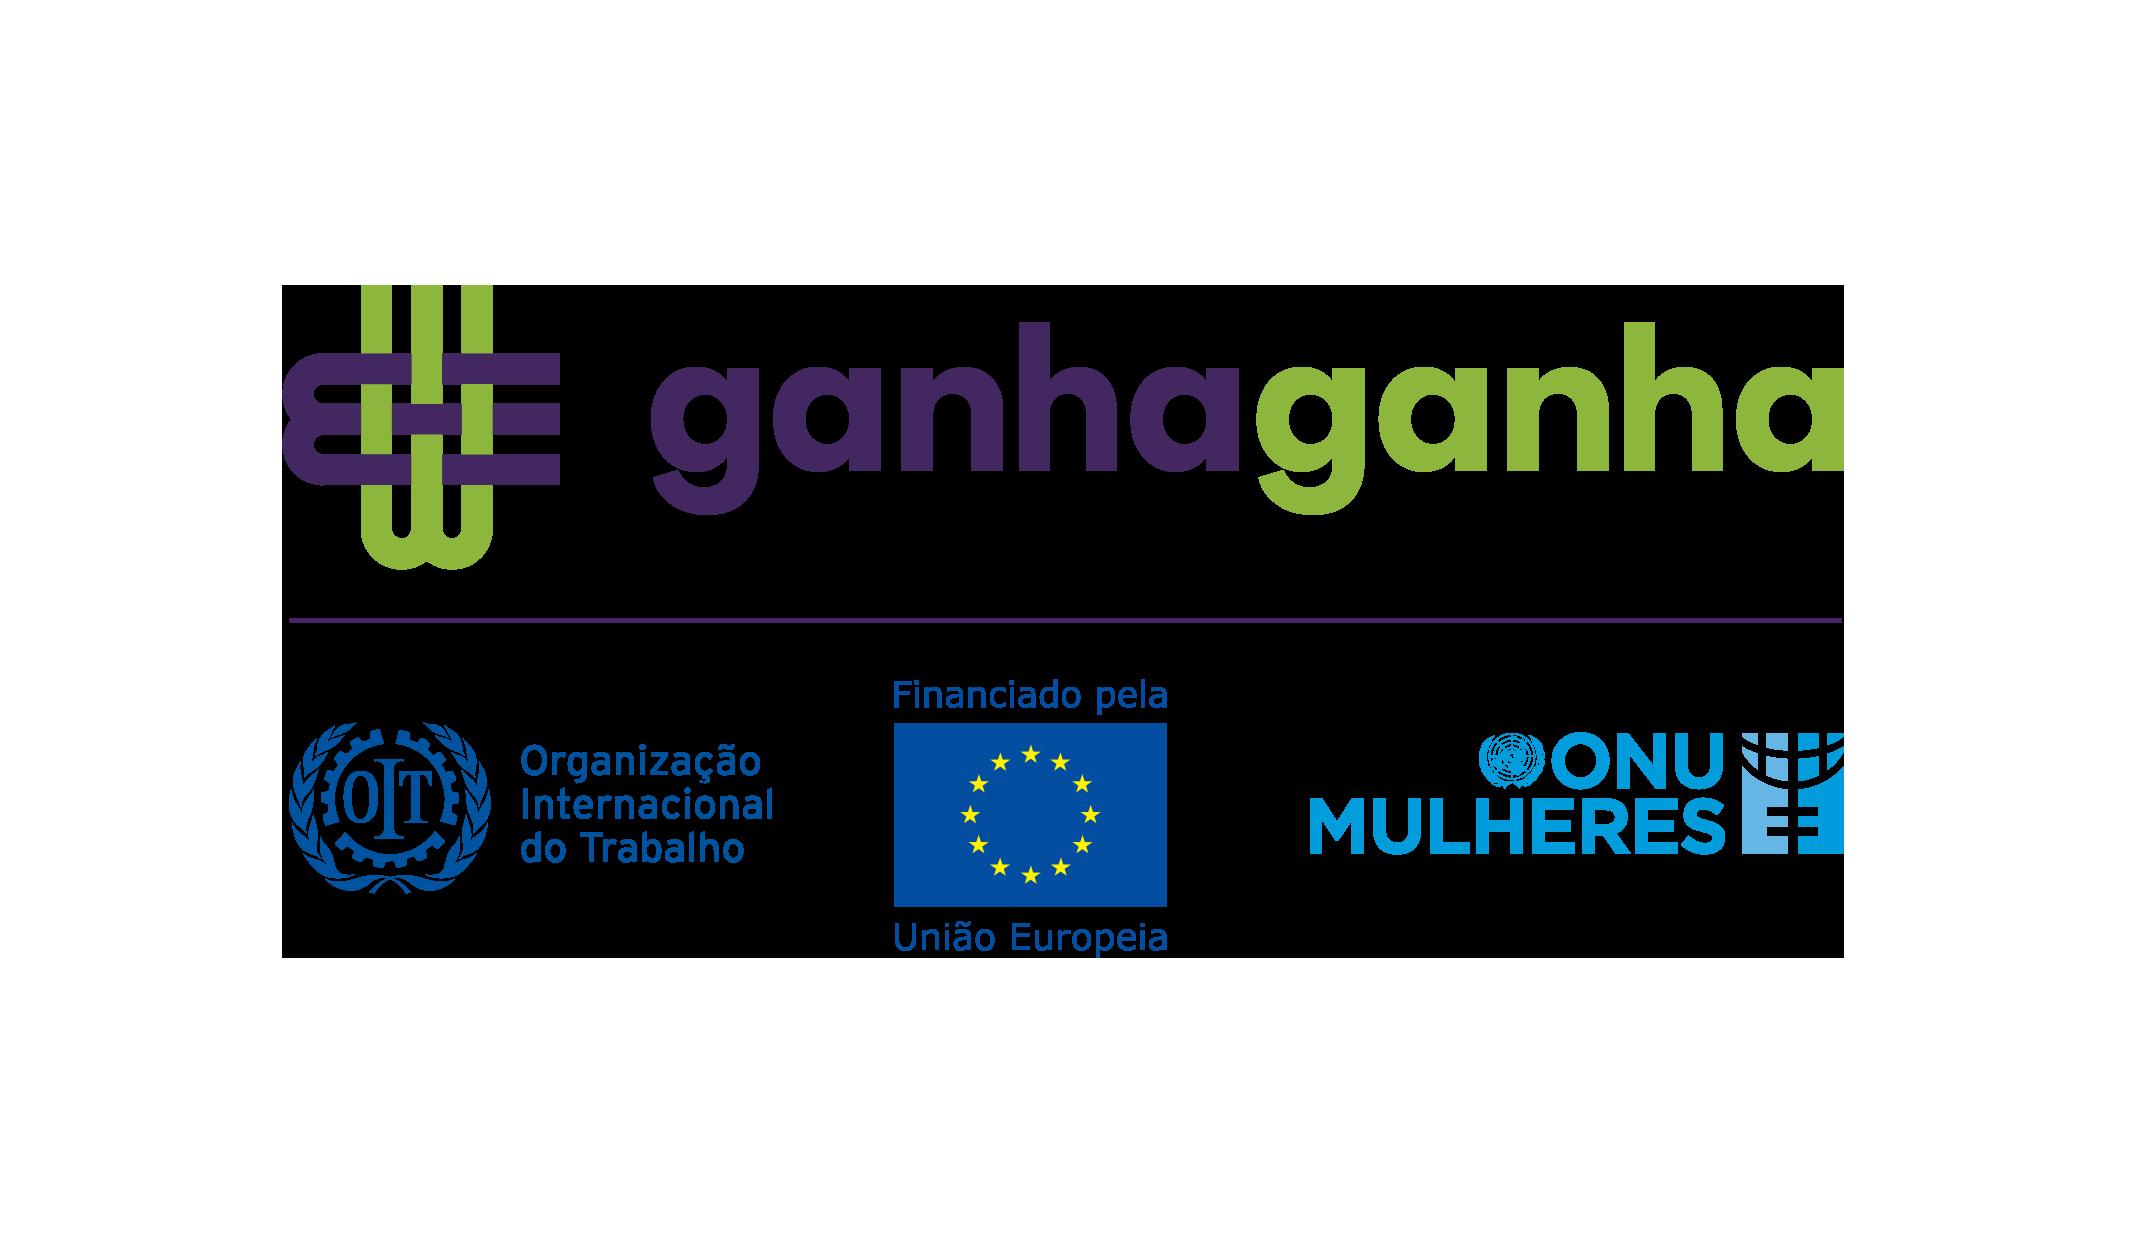 Logotipo-Pastilla-ganhaganha-portugues-RGB